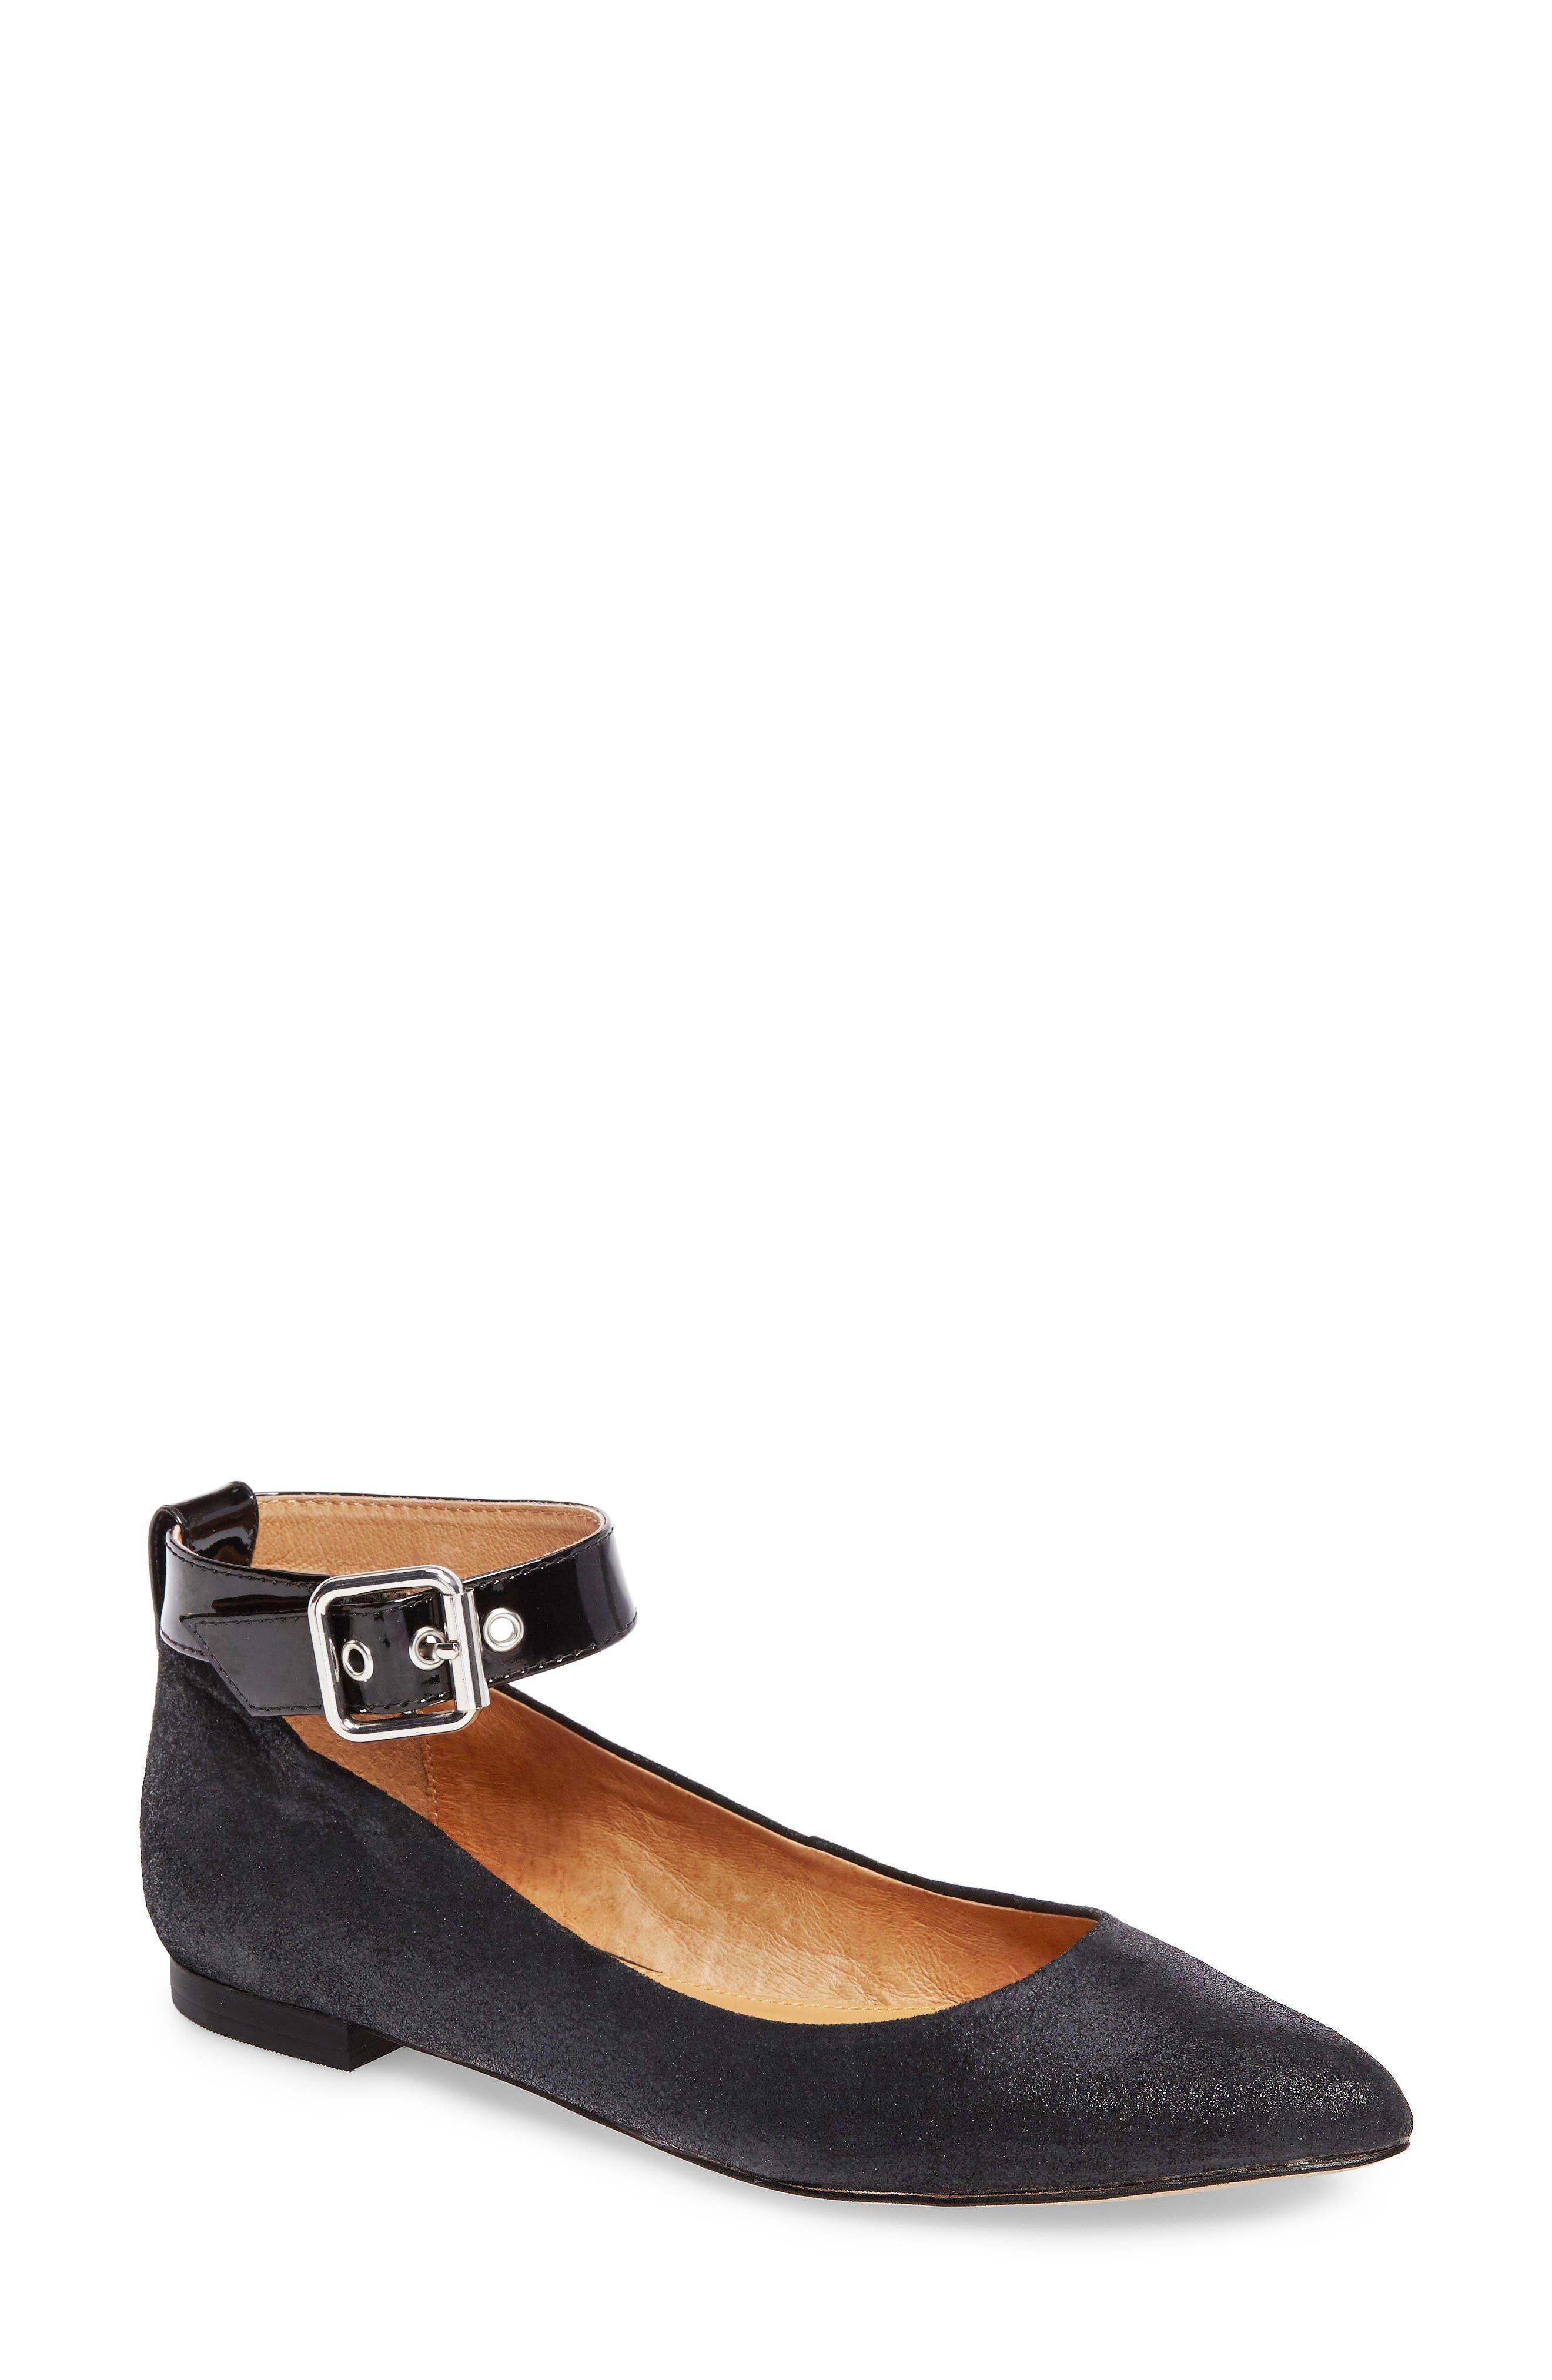 Main Image - Corso Como Ramona Ankle Strap Flat (Women)